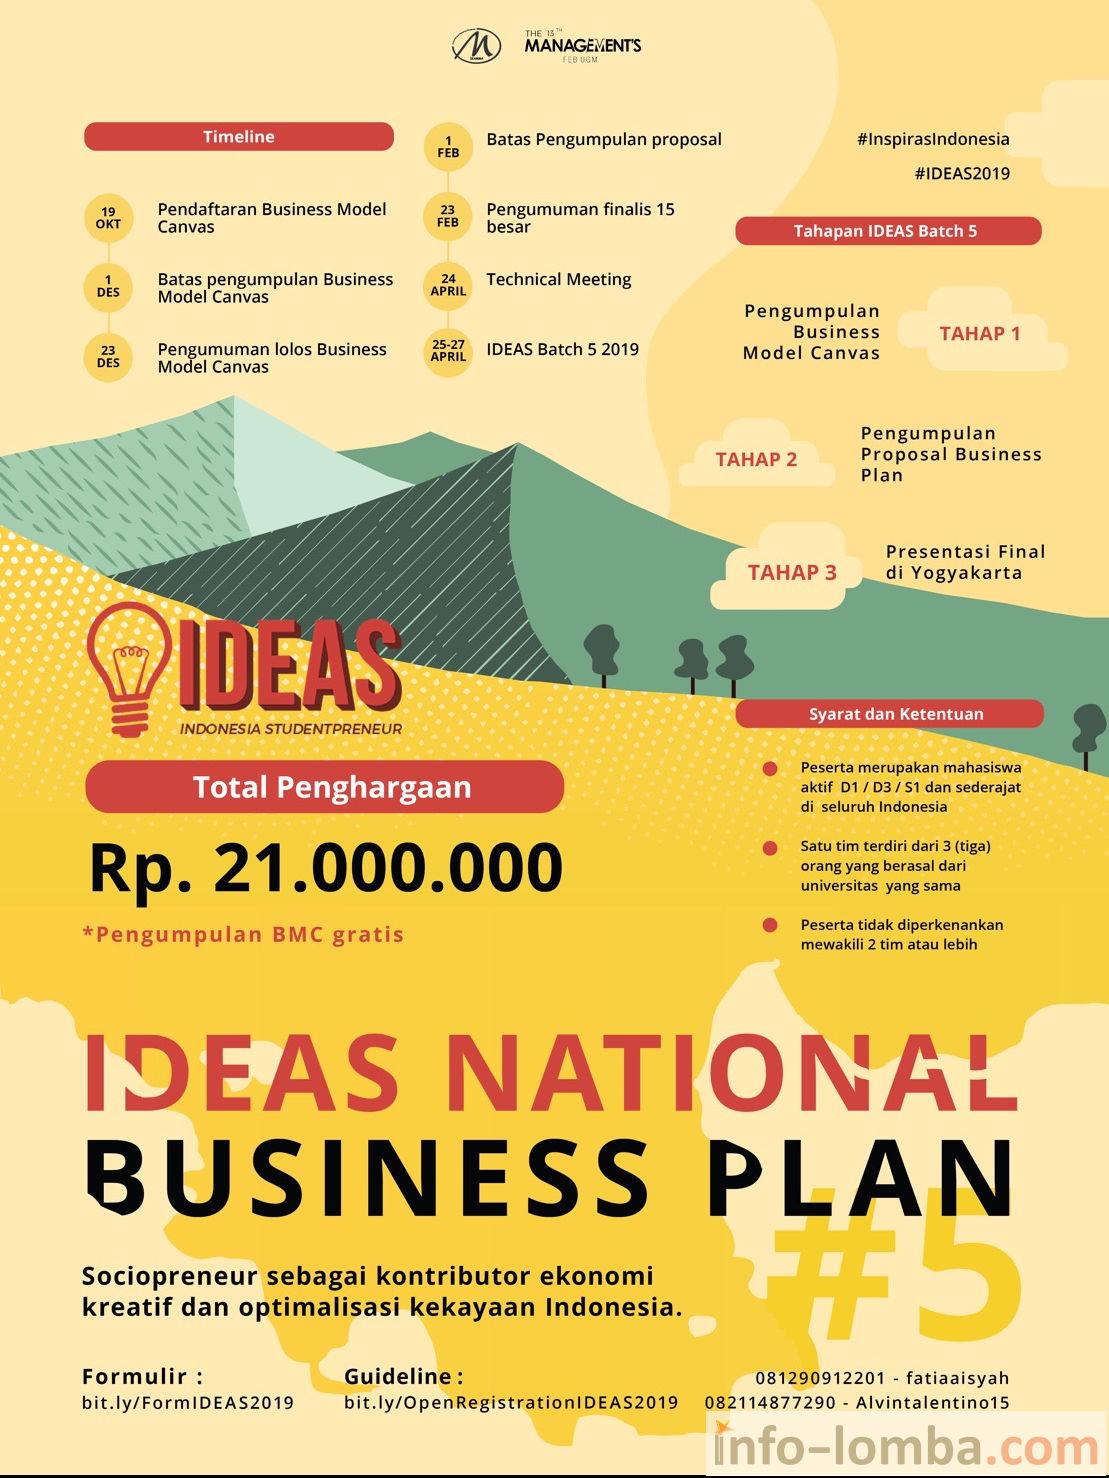 INDONESIA STUDENTPRENEUR BATCH #5